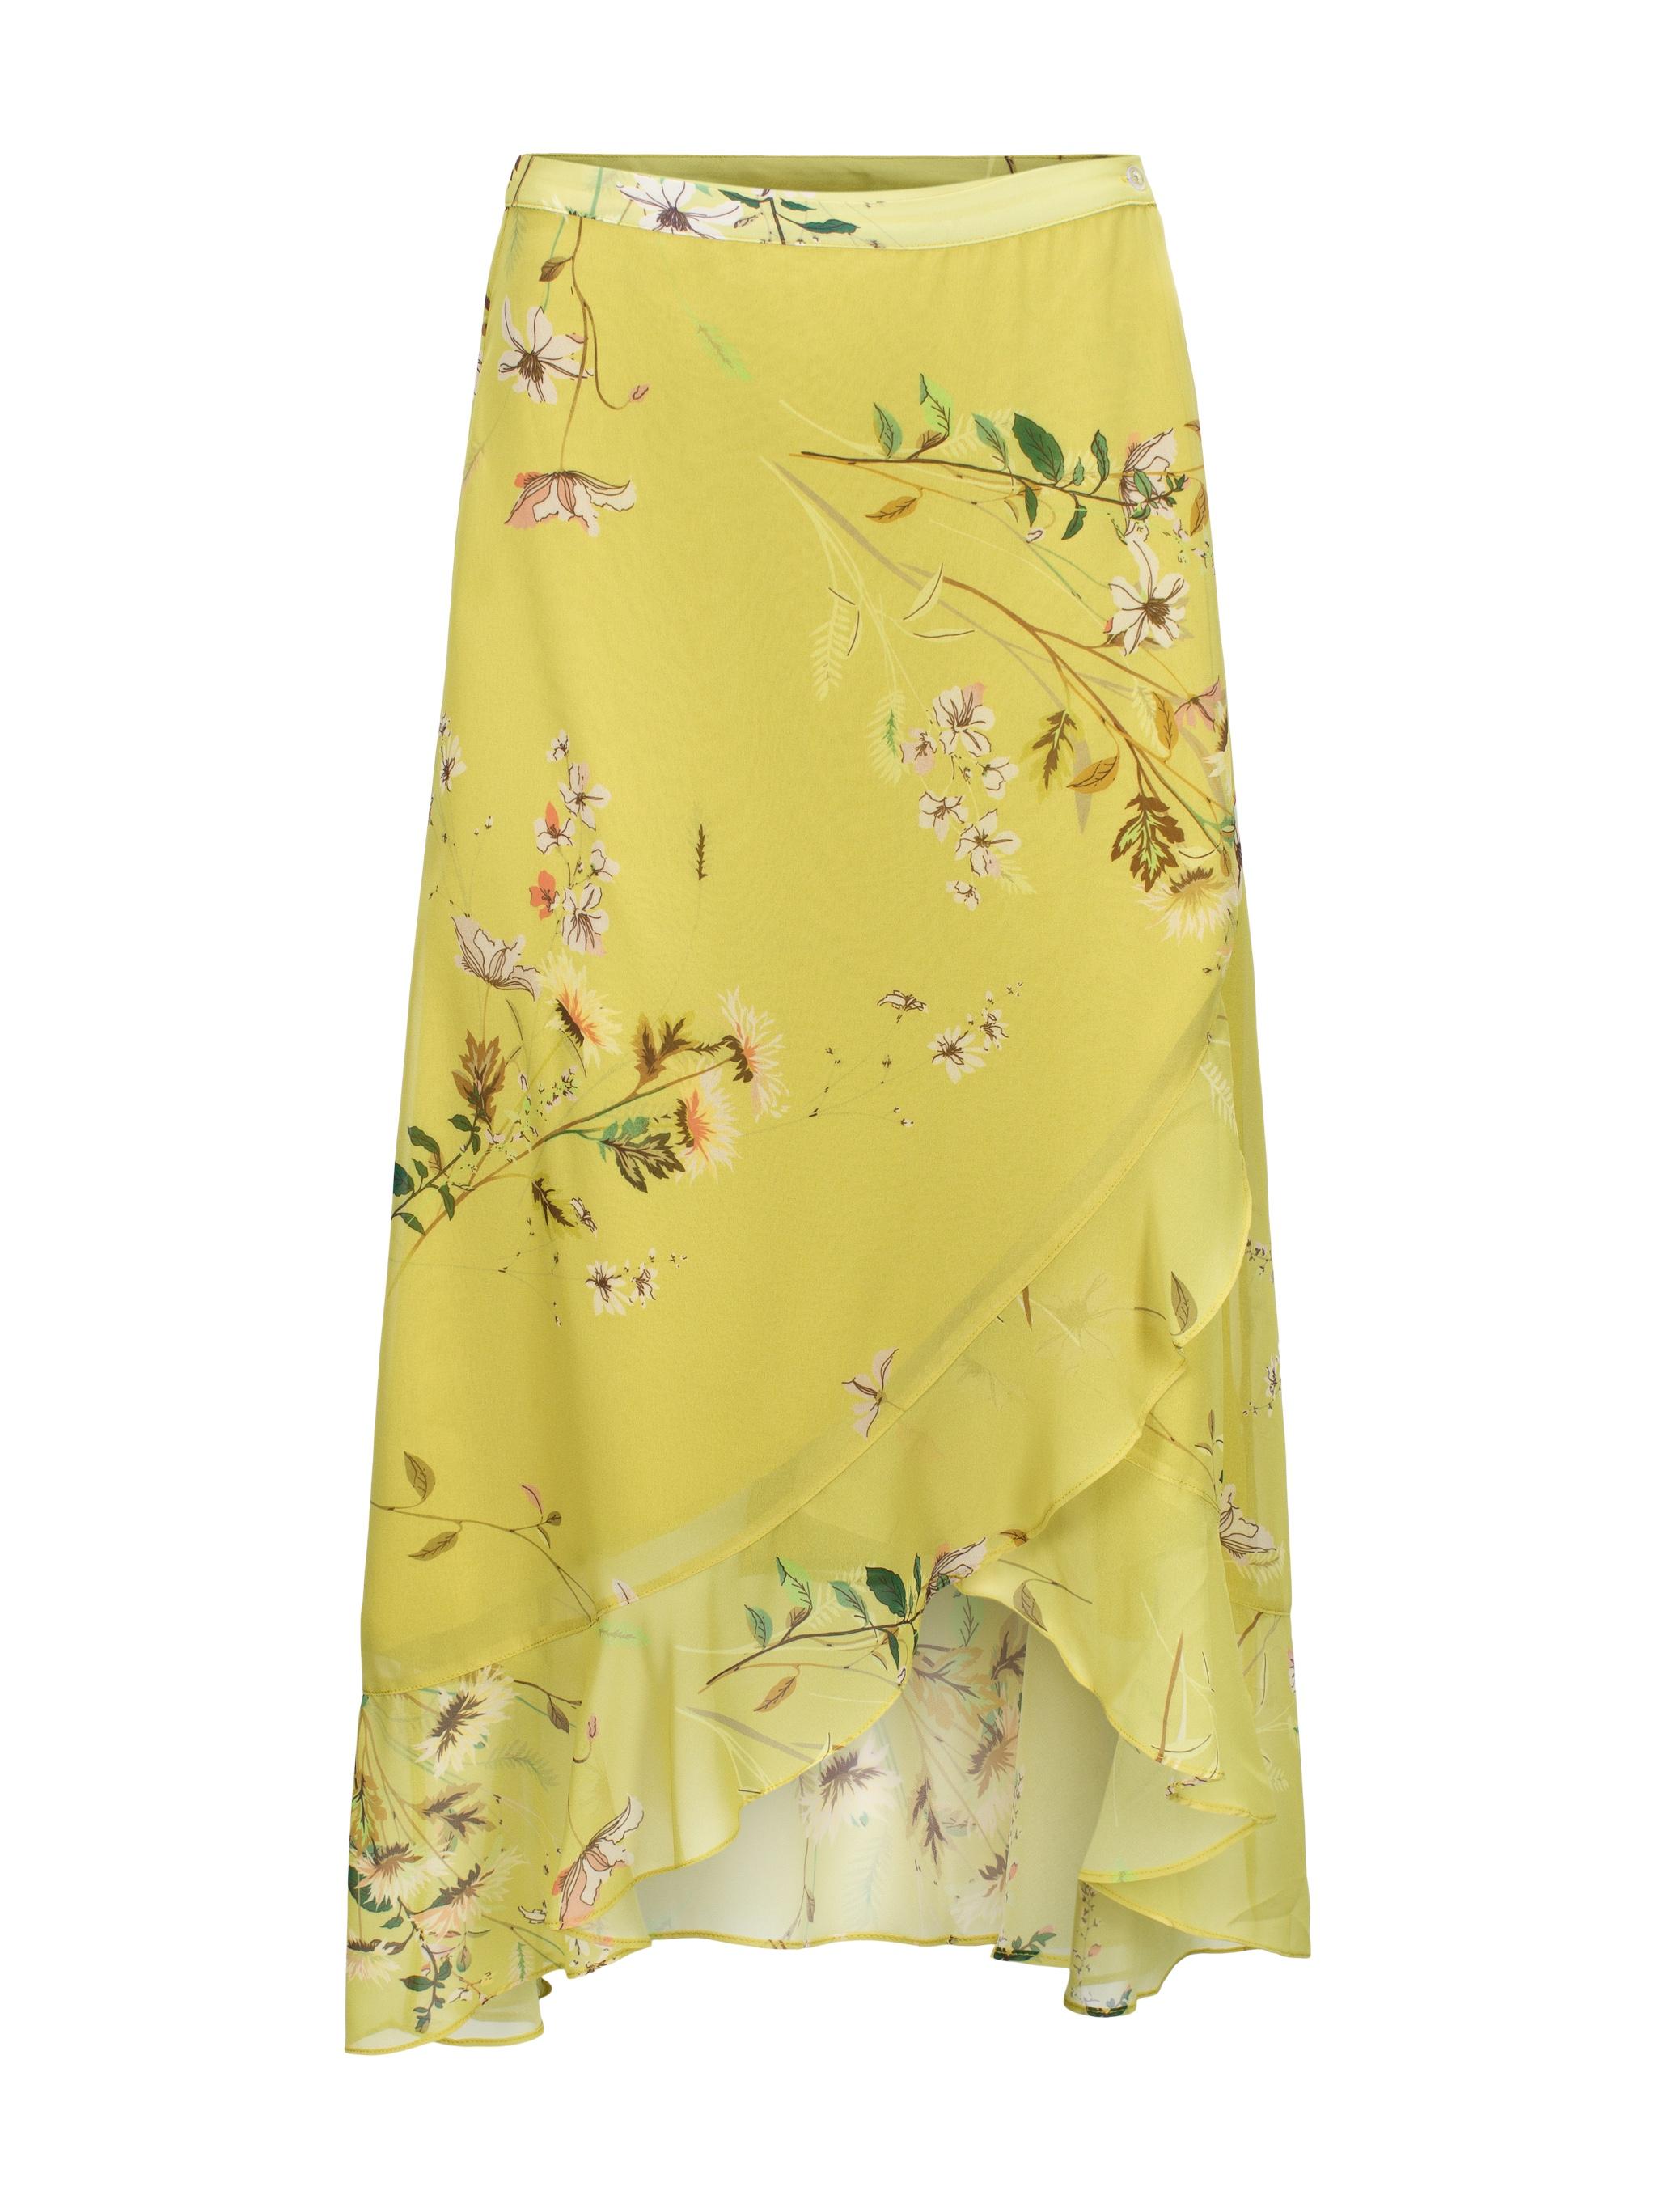 edb67f8b RICCOVERO - Volang Skirt Yellow FLower - Feel Good Store